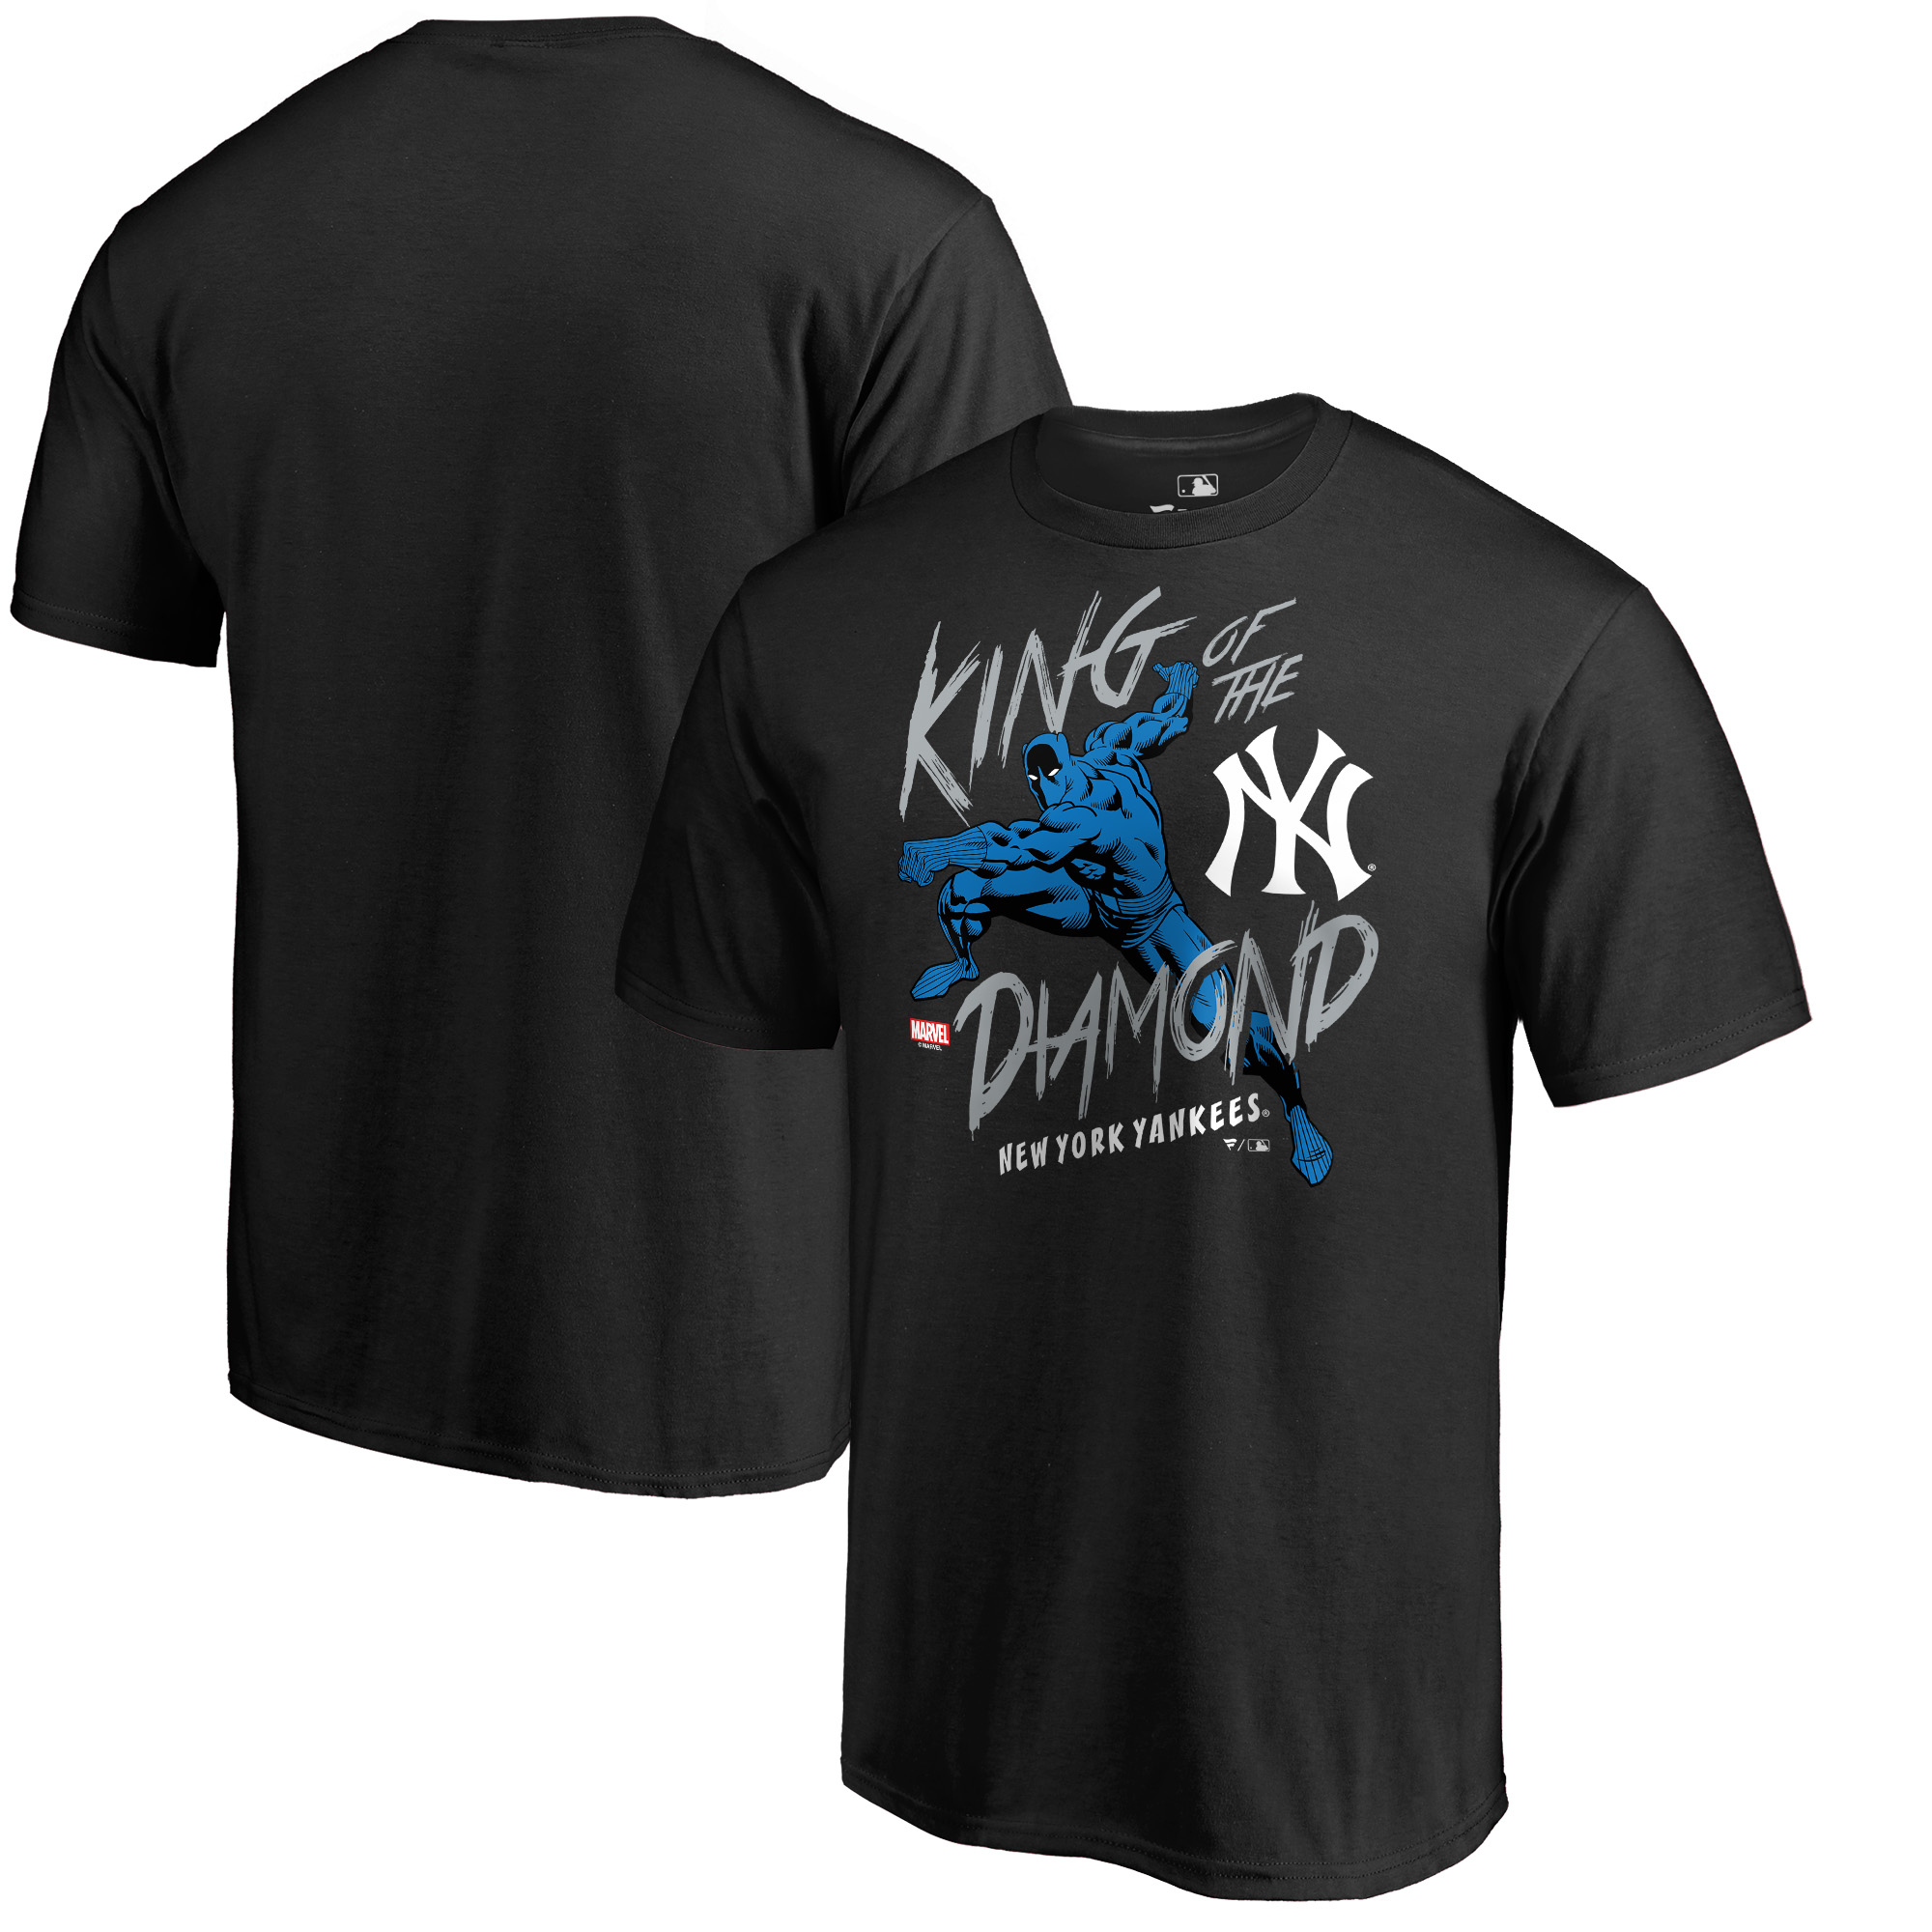 New York Yankees Fanatics Branded MLB Marvel Black Panther King of the Diamond T-Shirt - Black